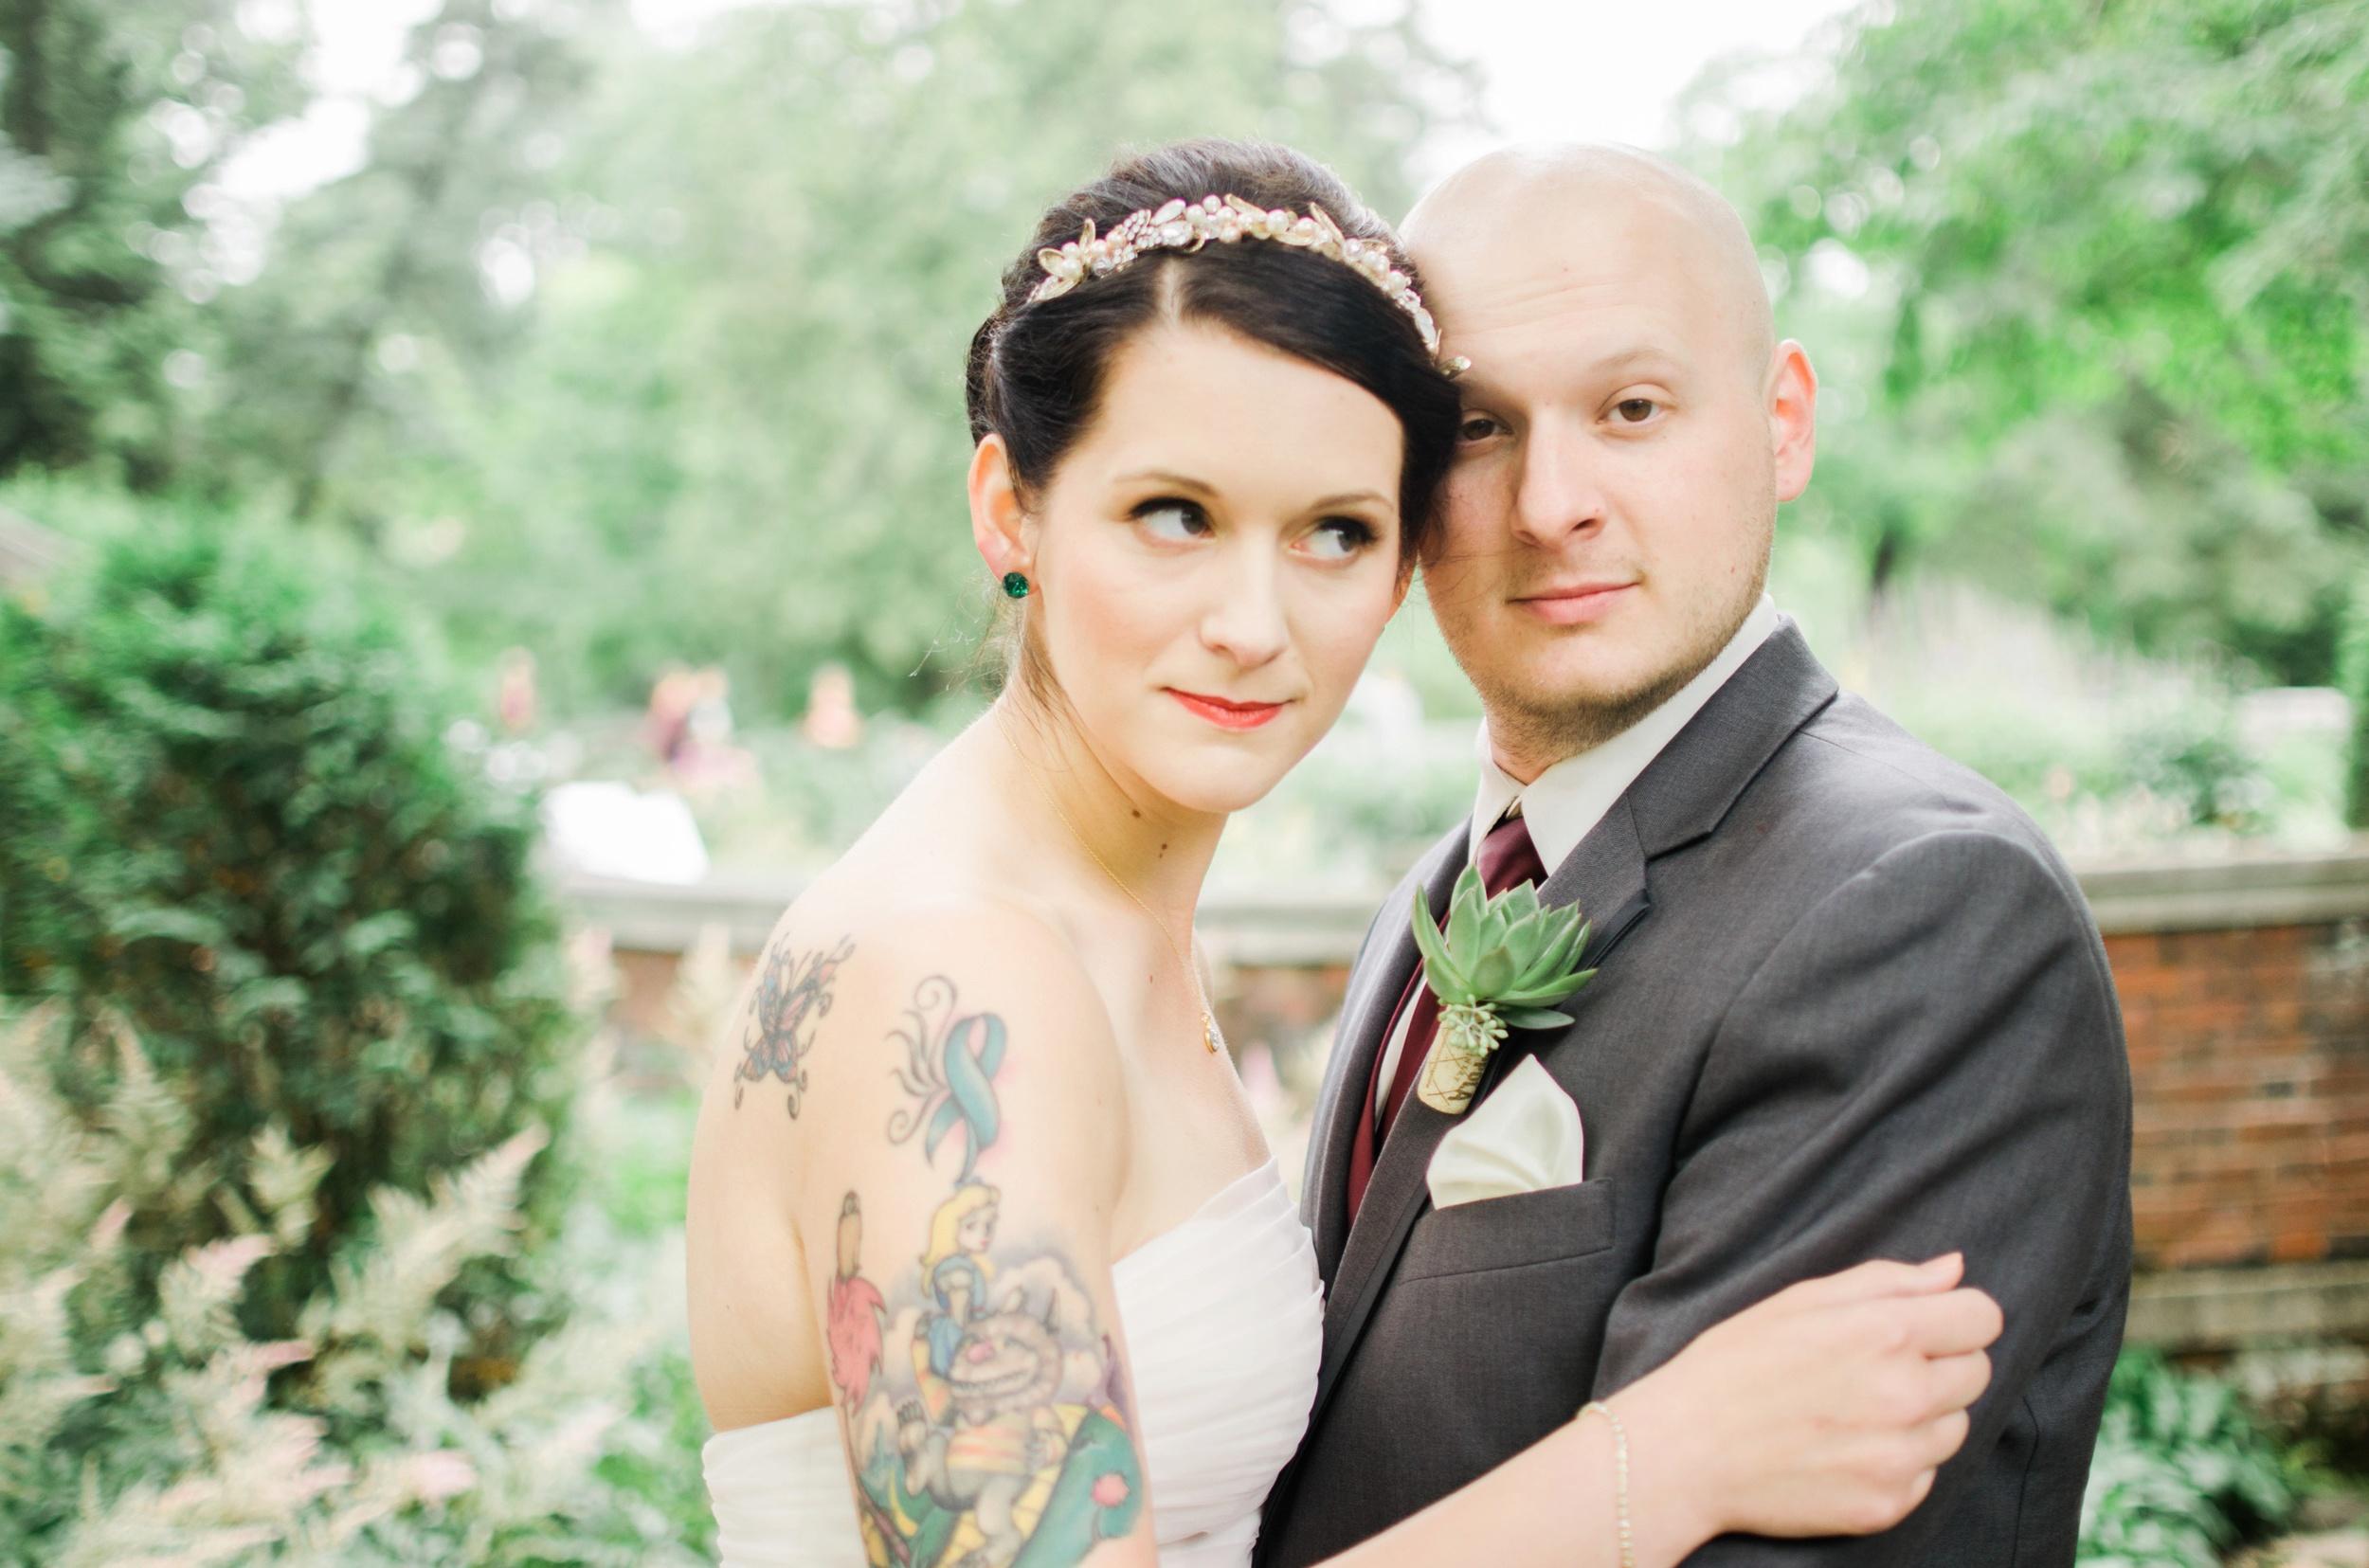 Glensheen Mansion Wedding | Duluth, MN Wedding Photographer_0479.jpg